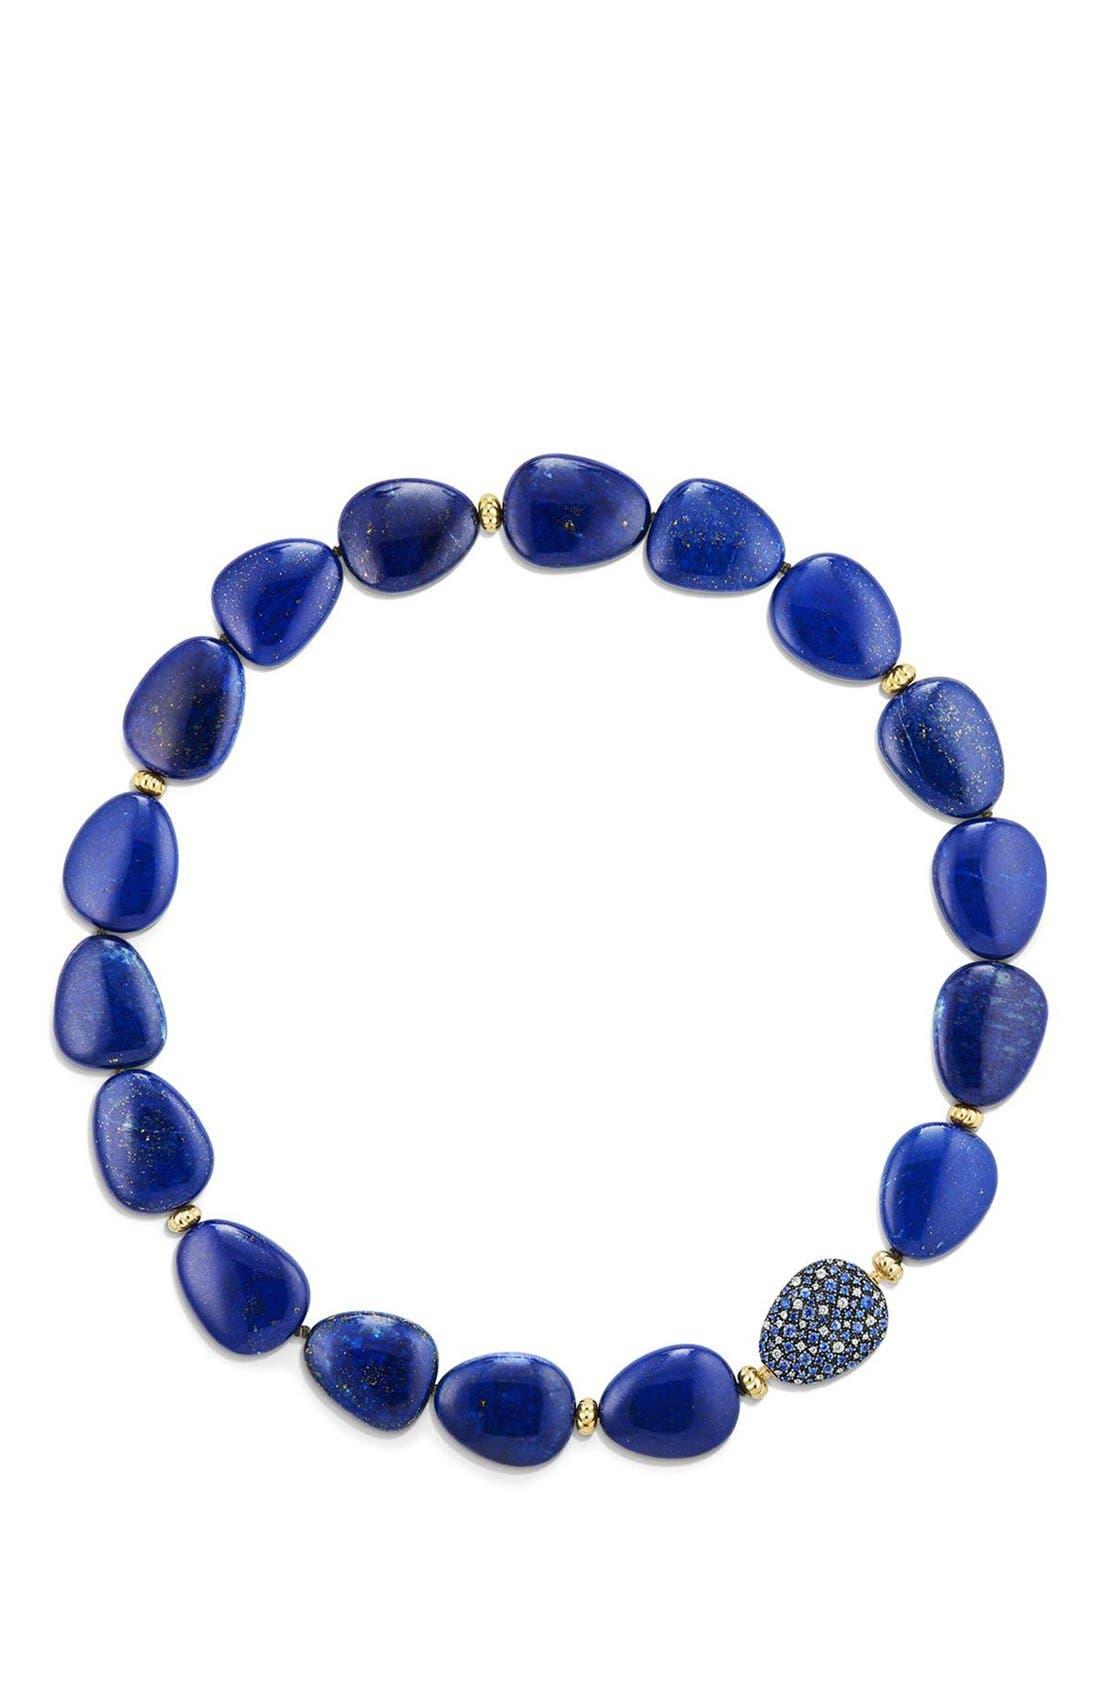 David Yurman 'Bead & Chain' Short Necklace with Jasper & Sapphires in 18K Gold